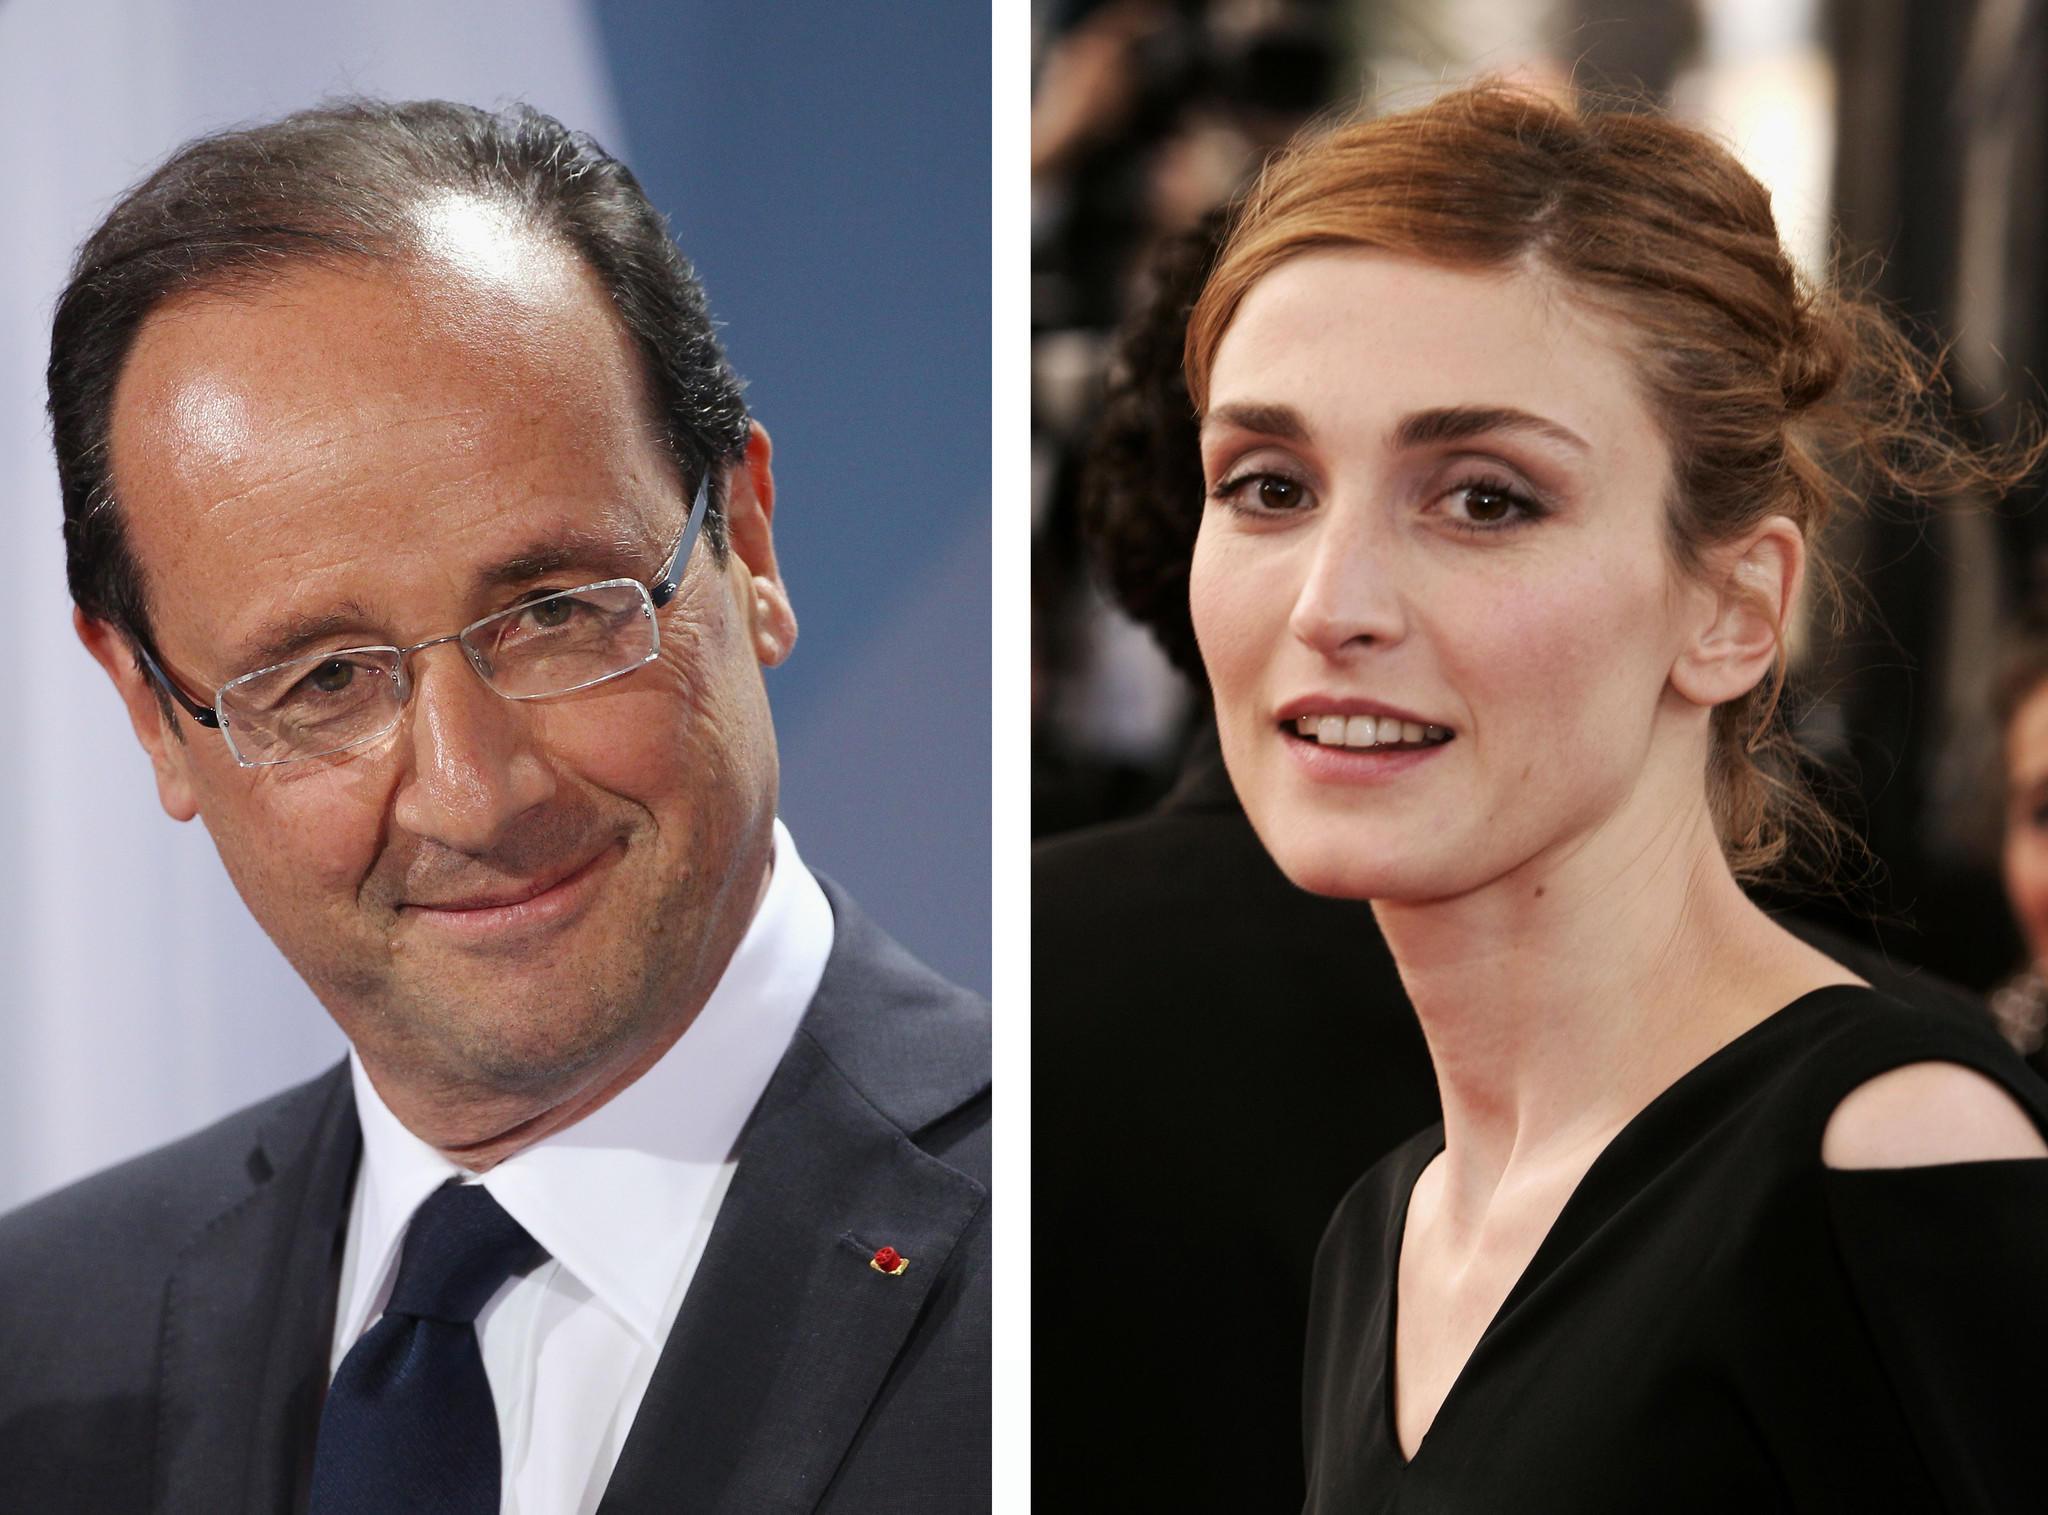 A composite image shows president of France Francois Hollande (L) and actress Julie Gayet.